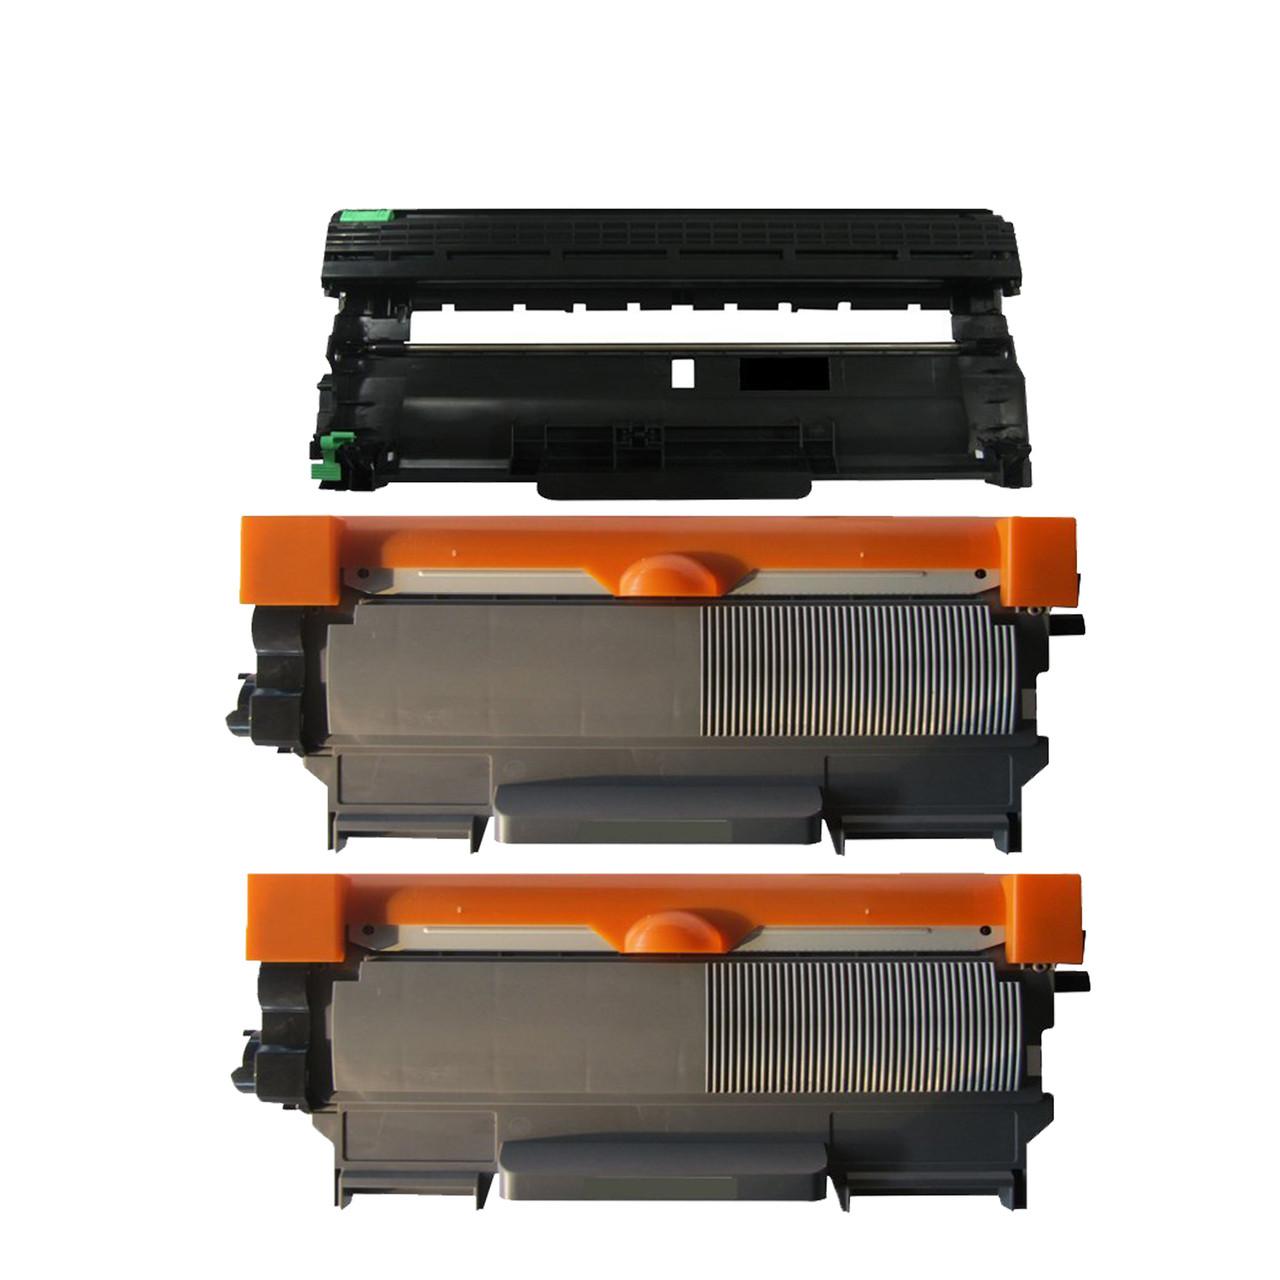 New Compatible DR510 /& TN570 Toner /& Drum Cartridge For Brother HL-2240 HL-2240